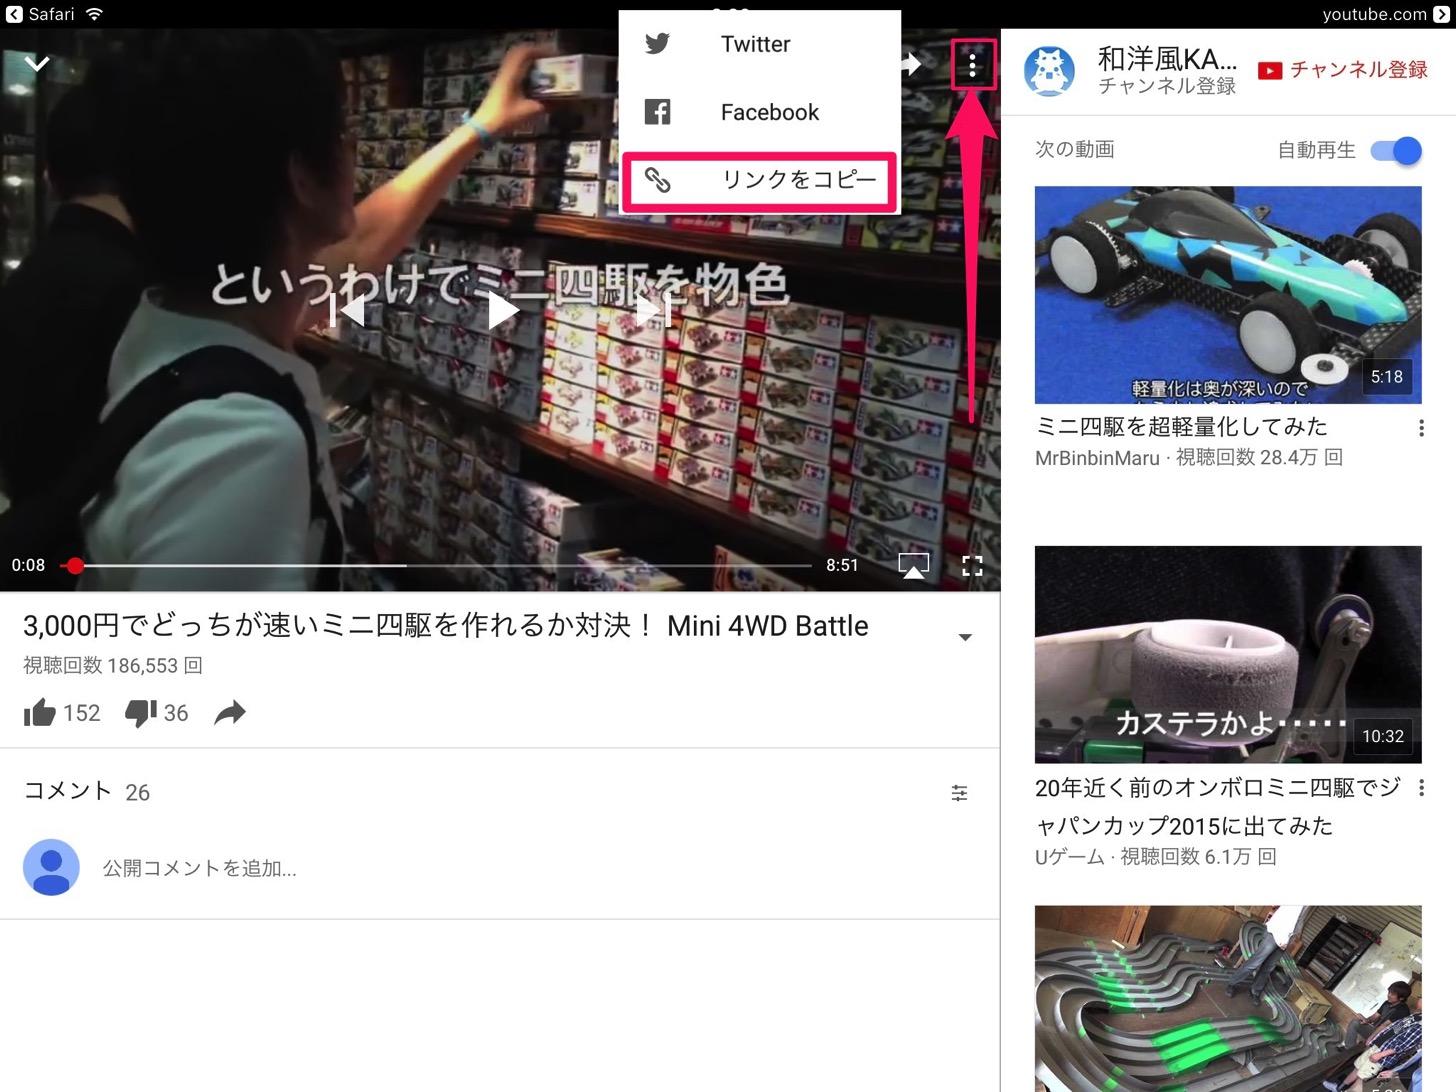 YouTubeの動画URLを取得